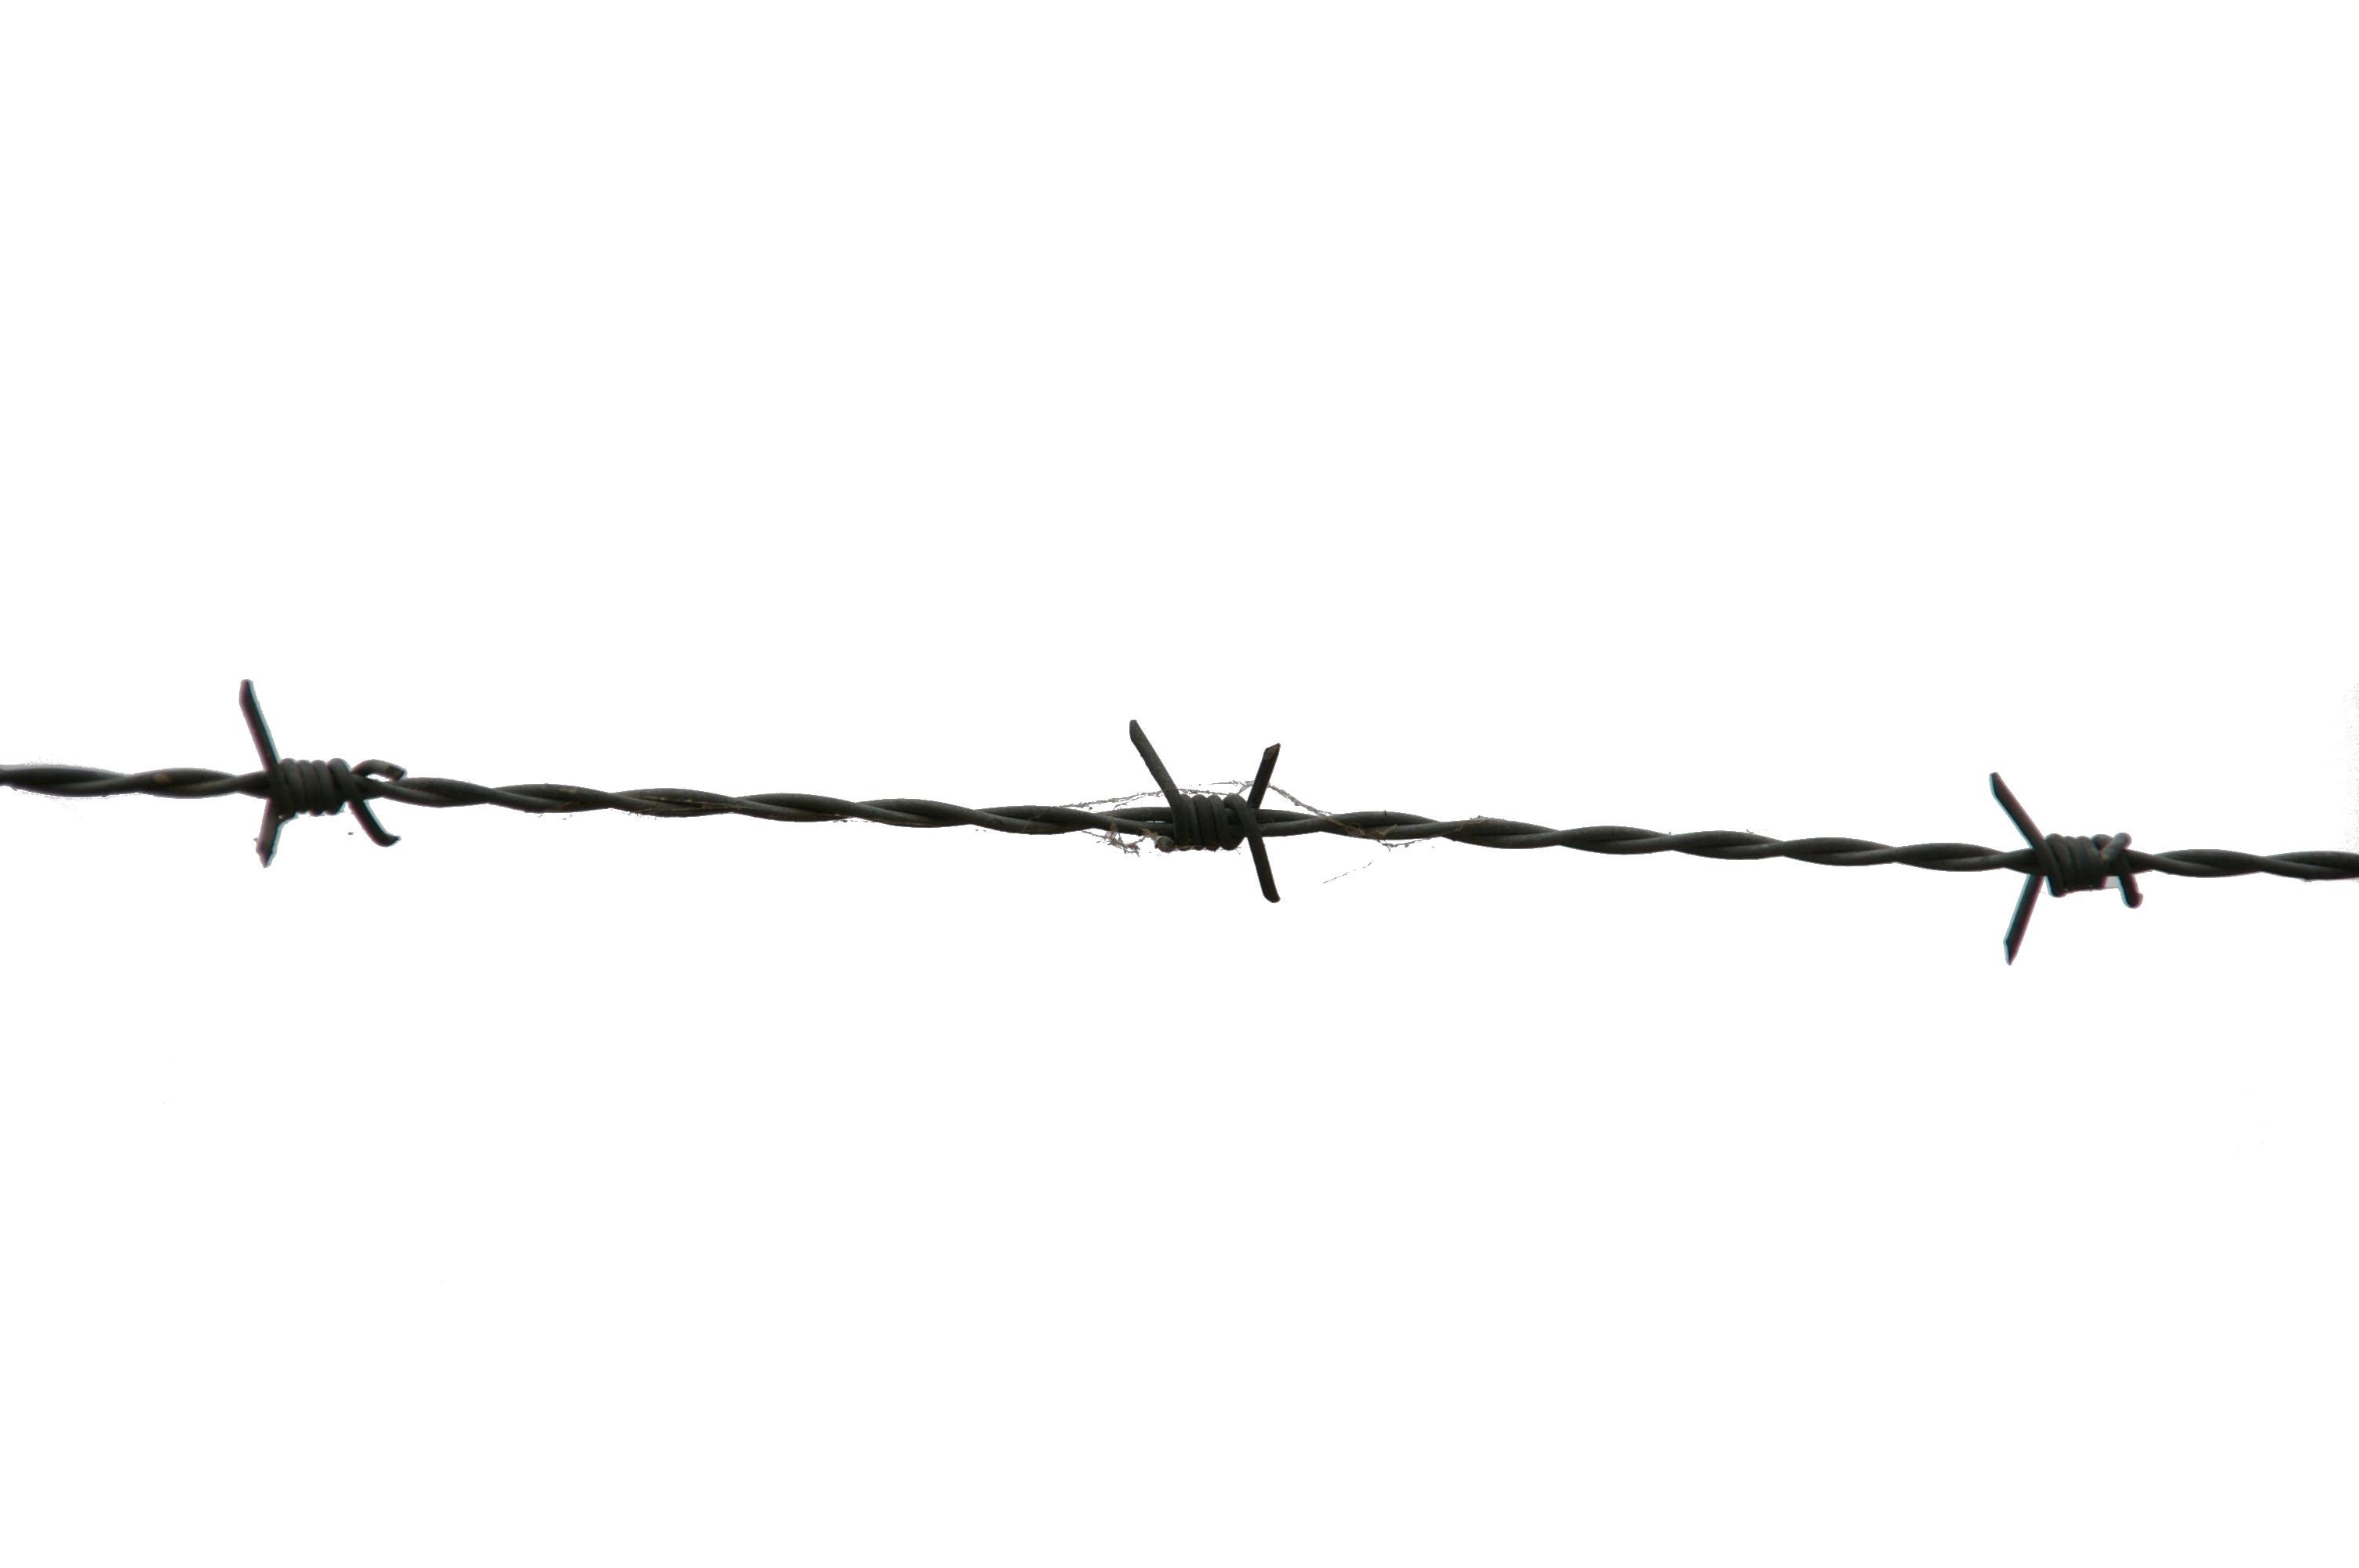 Barbed wire - Wikipedia